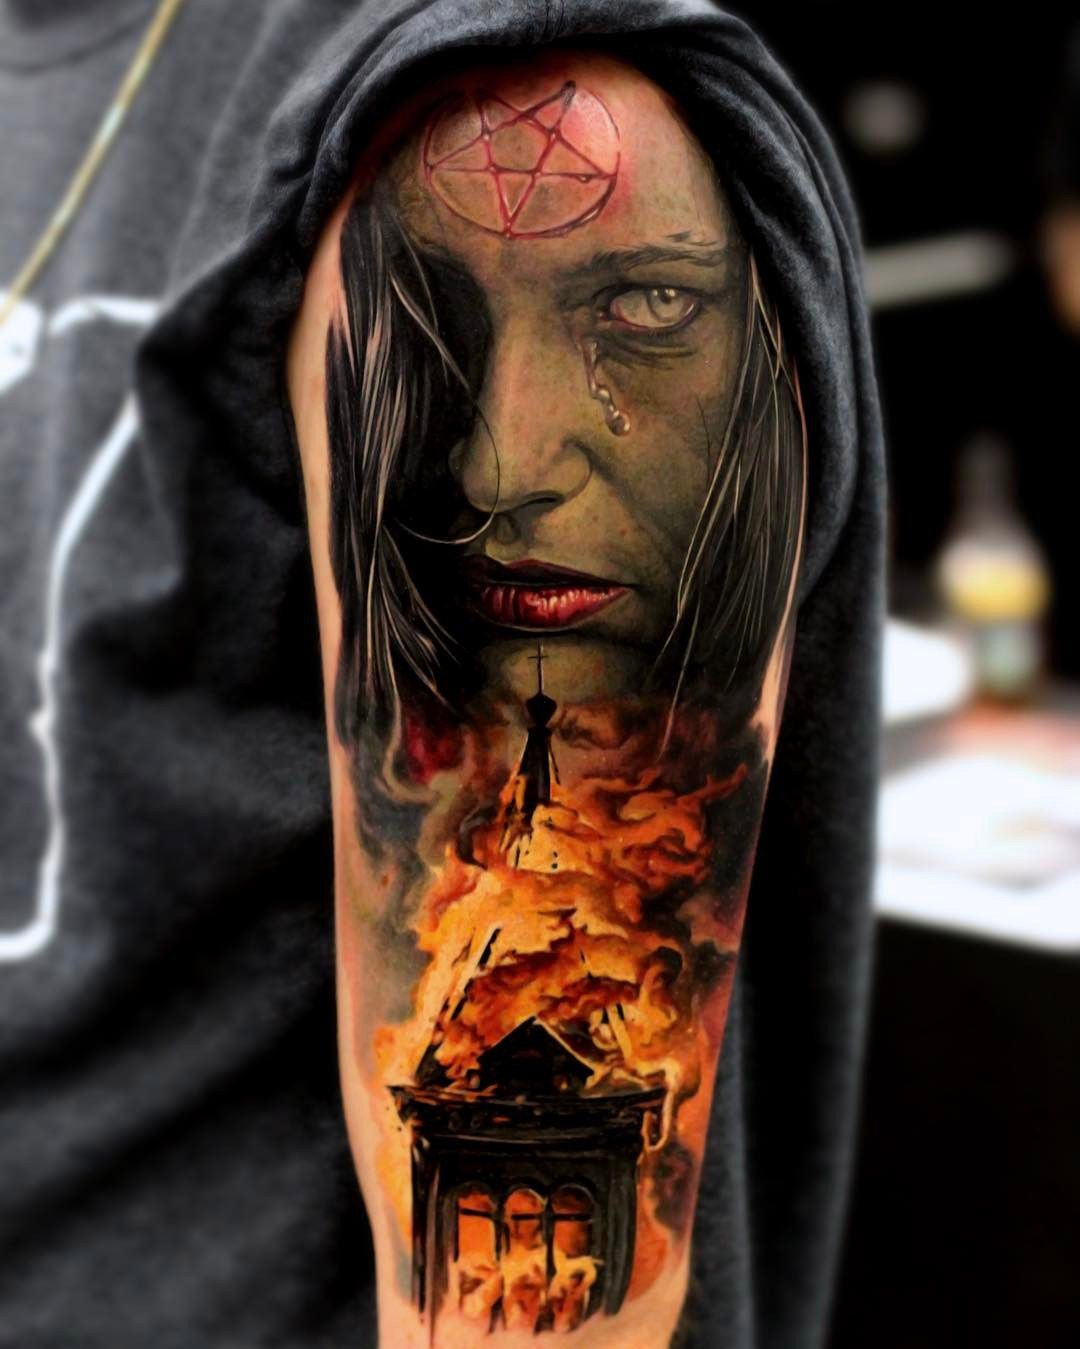 satanic burning church pinterest churches tattoo and tatting. Black Bedroom Furniture Sets. Home Design Ideas